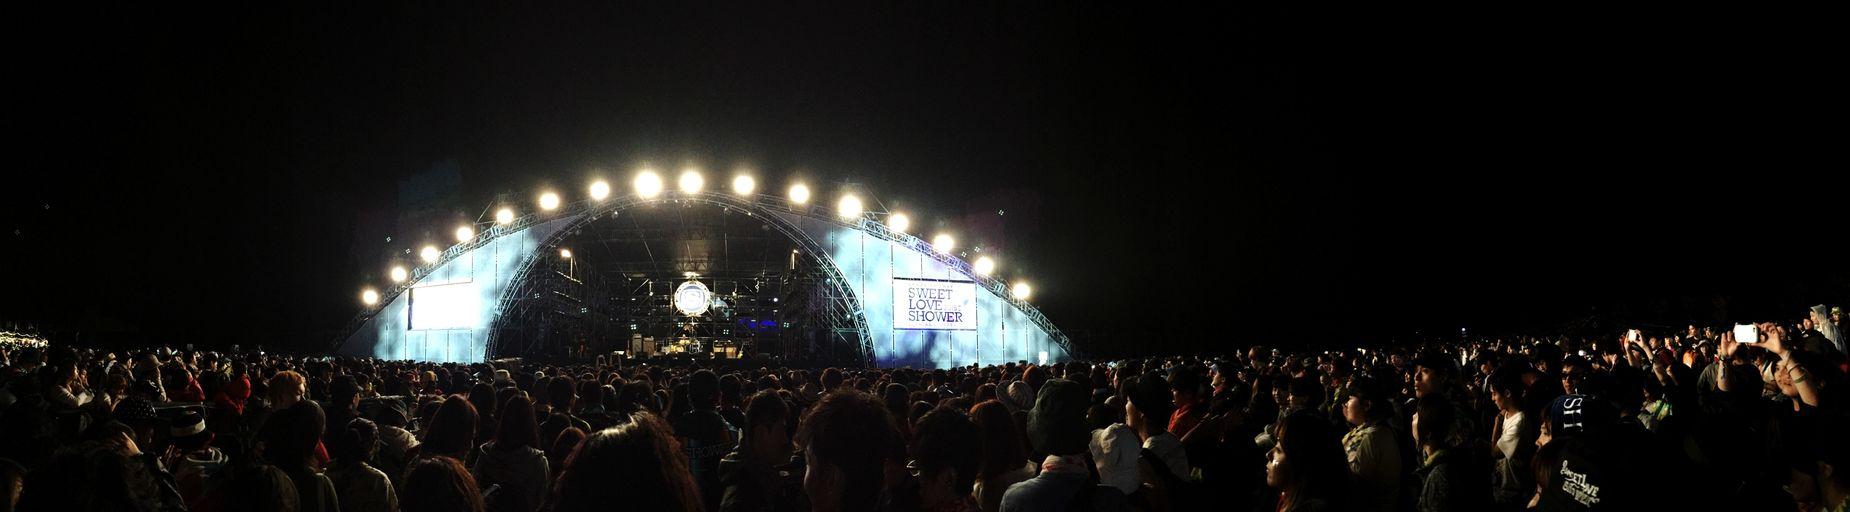 Sweetloveshower ラブシャ Live Music Music Festival Having Fun Everyday Joy Rock Band For The Love Of Music